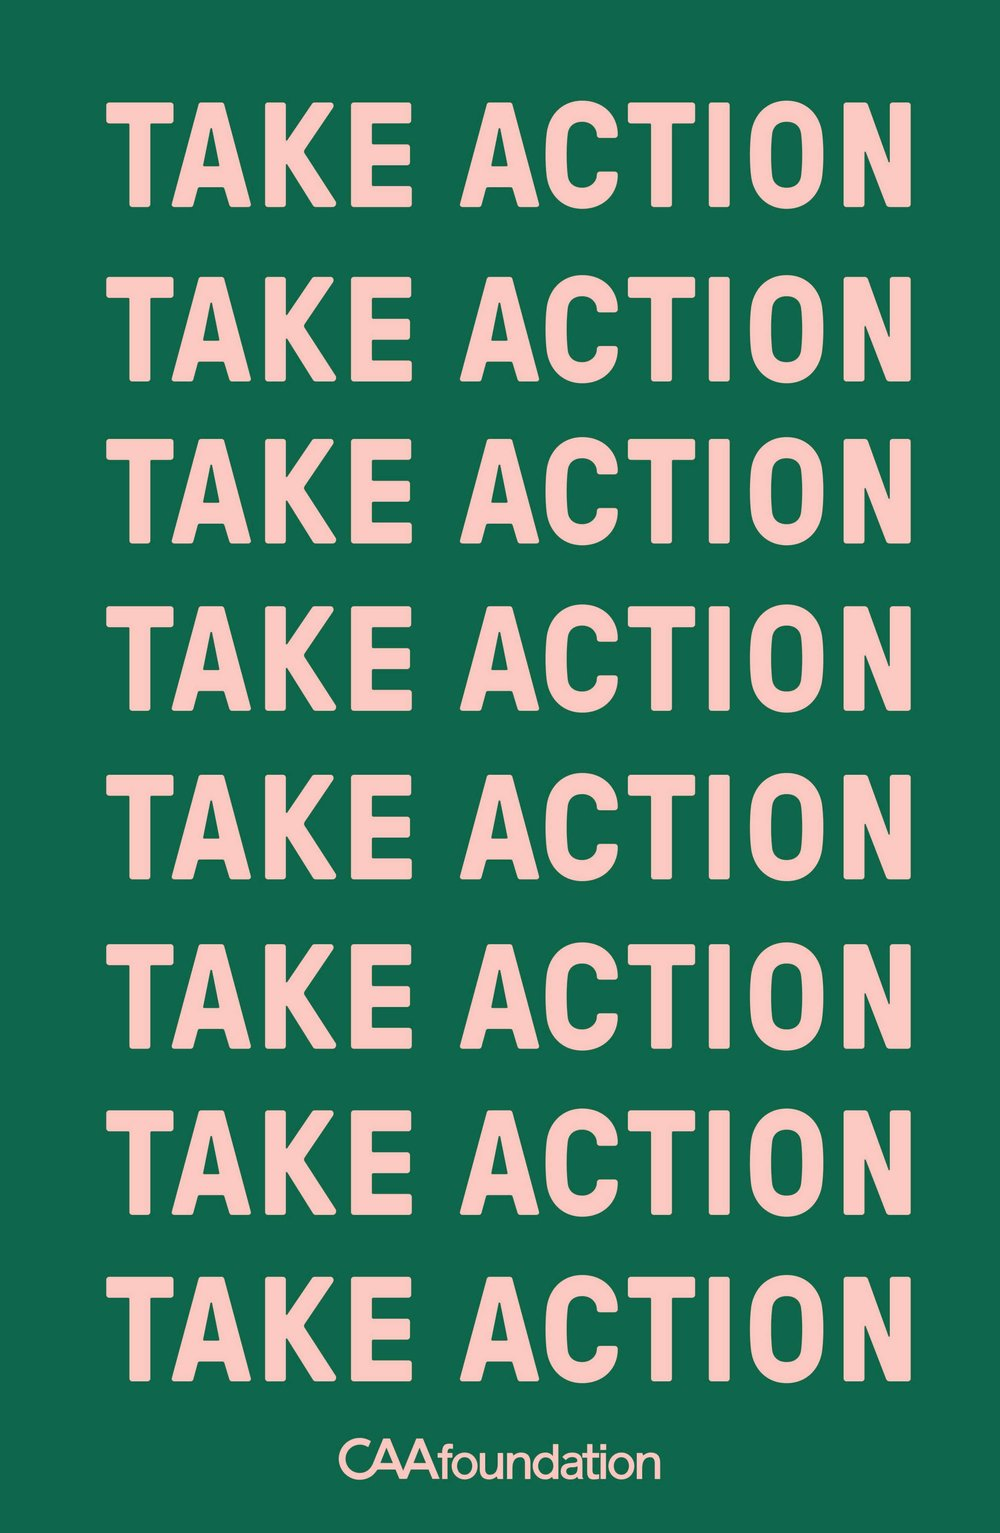 Take_Action_Posters_v5-13.jpg